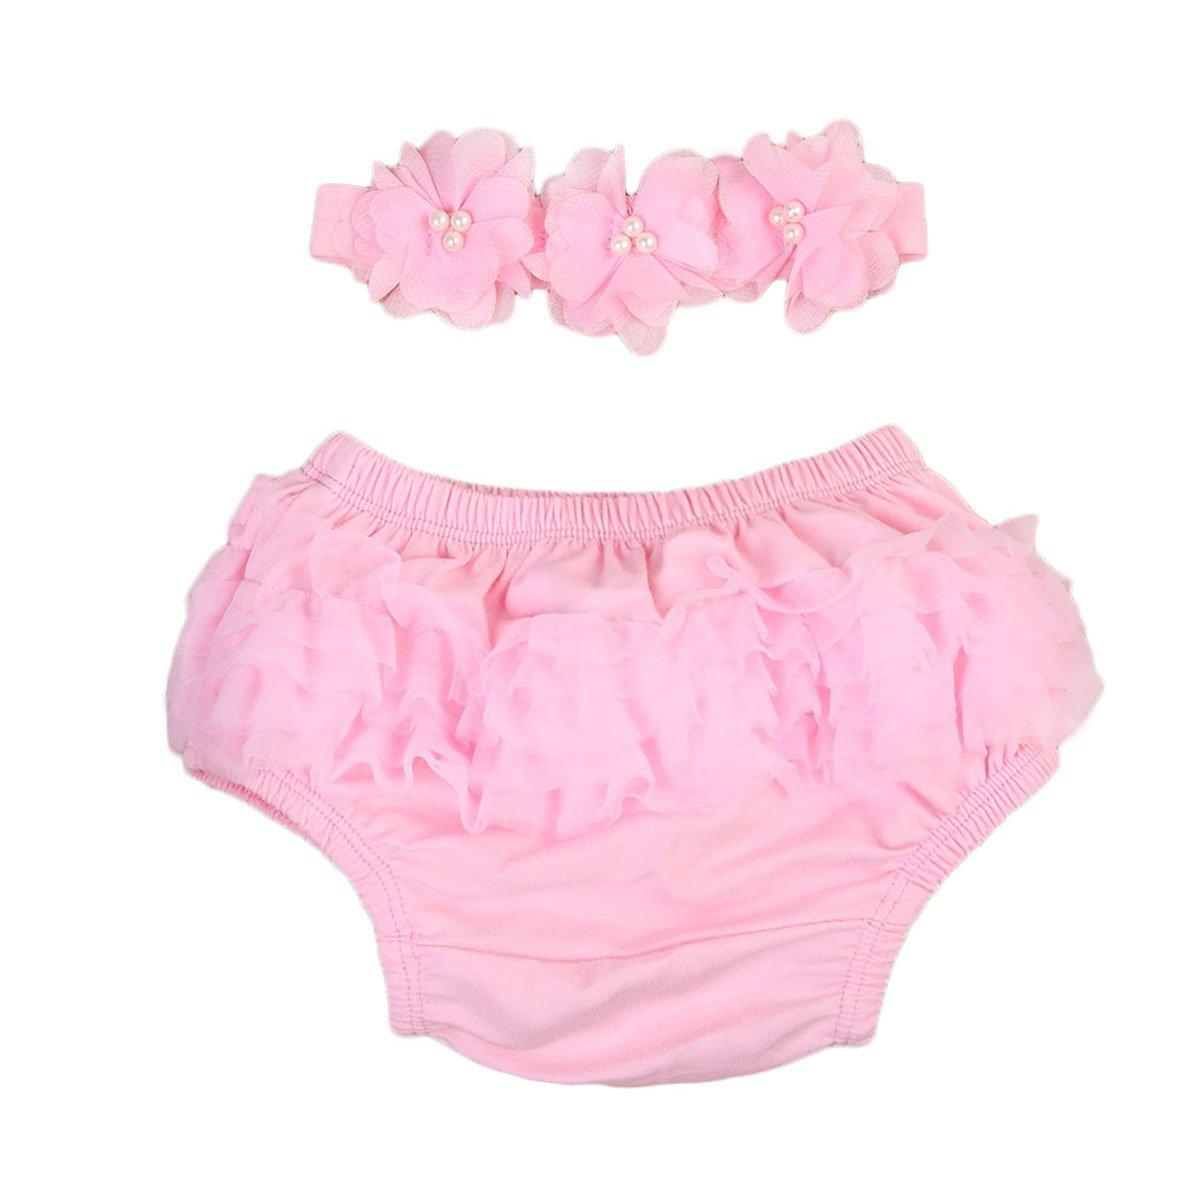 Newborn Baby Girl Bloomer Tutu Ruffle Nappy Diaper Covers Headband Outfits Set